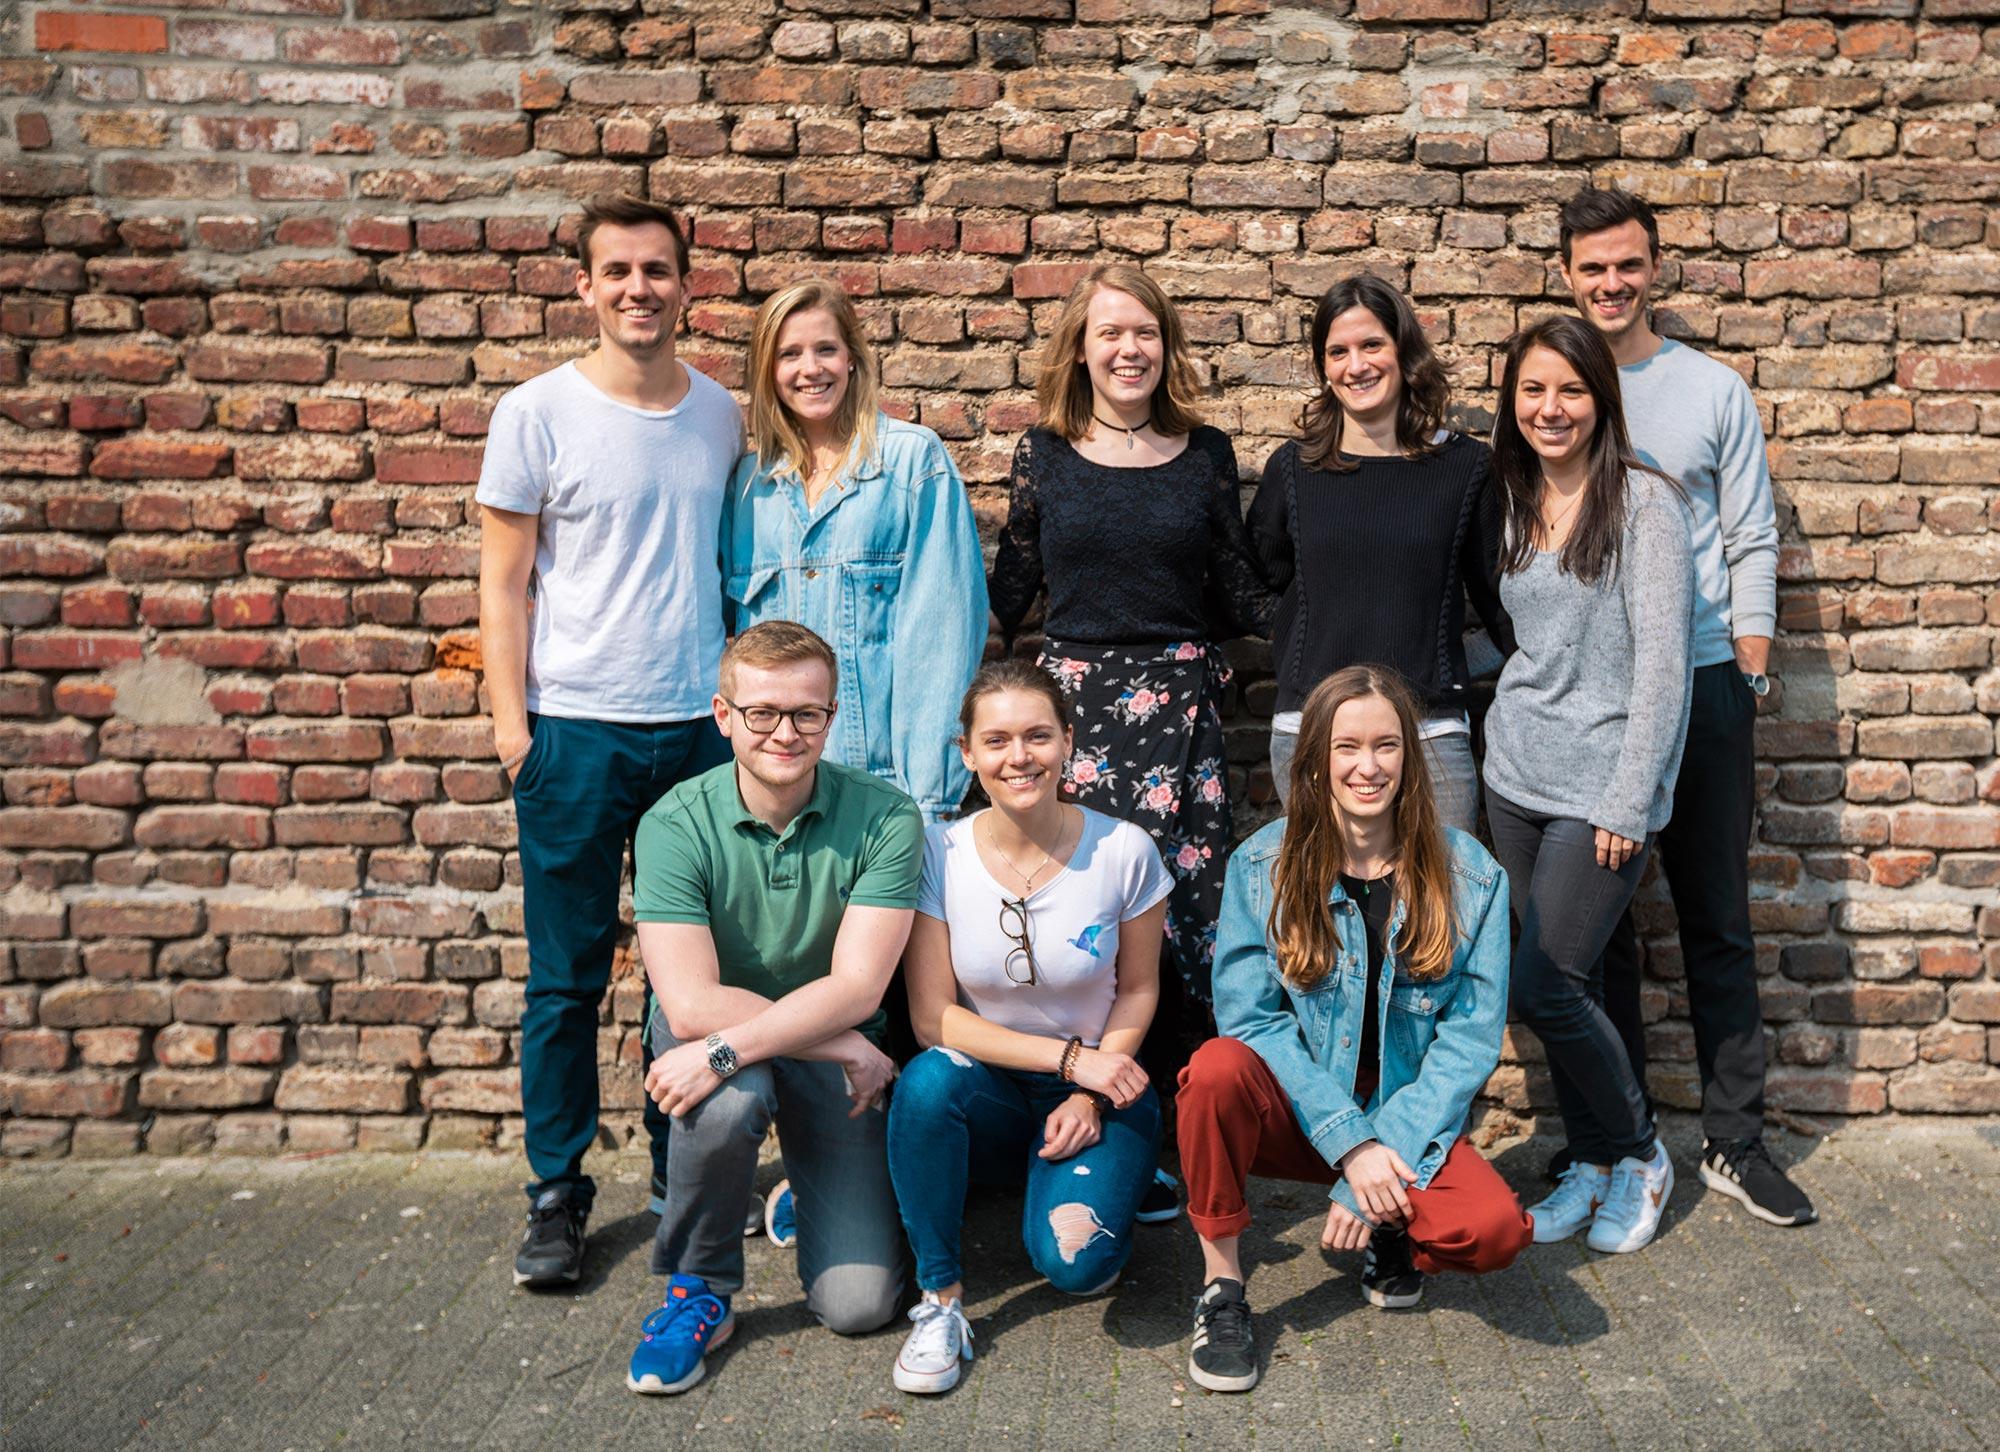 Das Team von Socialbnb